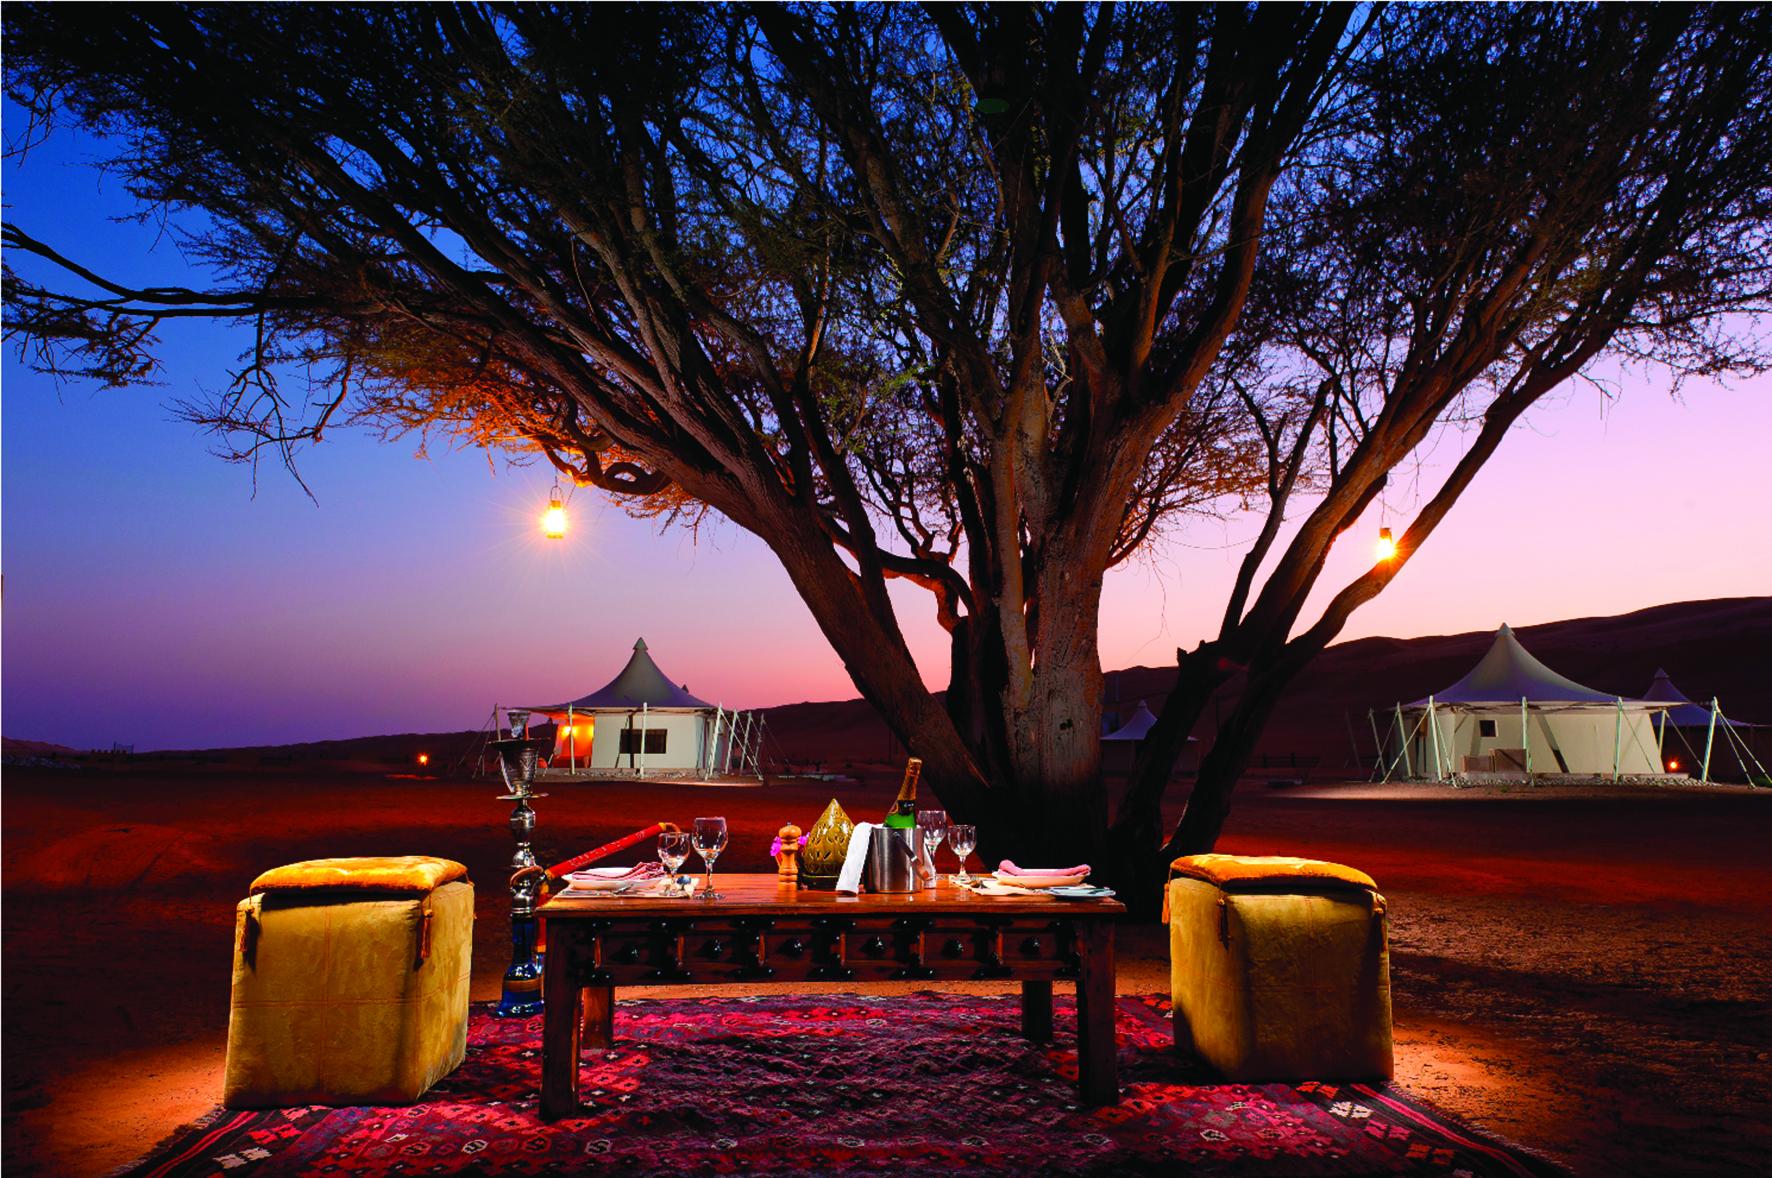 desert-night-camp-private-dining-night